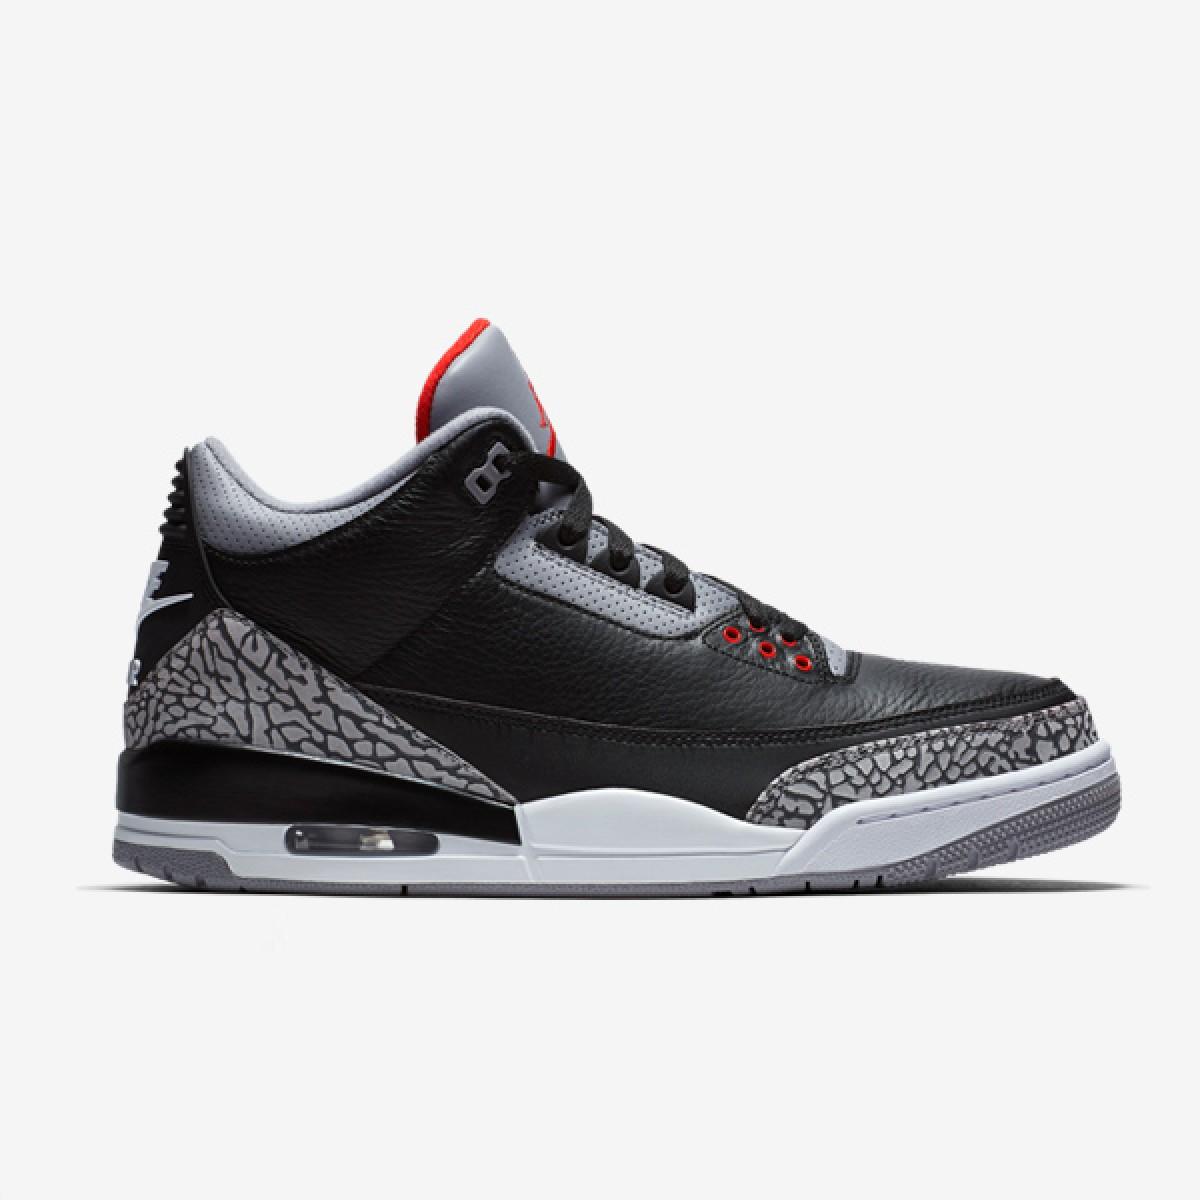 Air Jordan 3 Retro 'Black Cement'